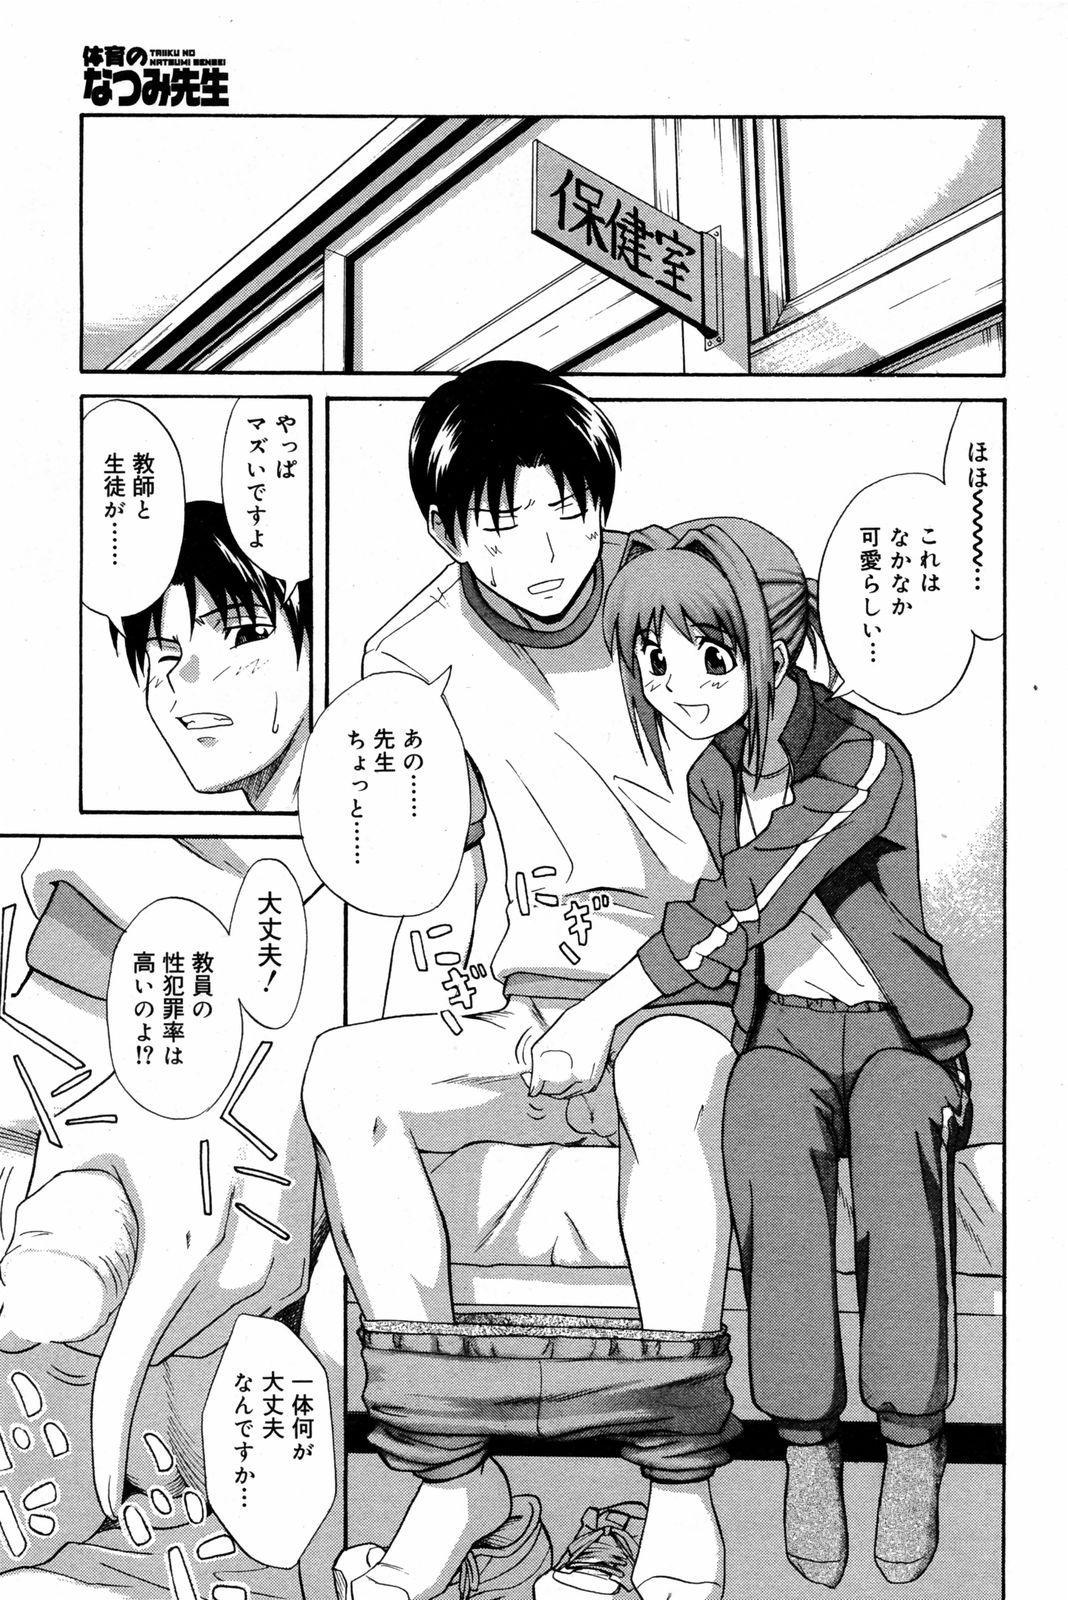 Manga Bangaichi 2008-03 86